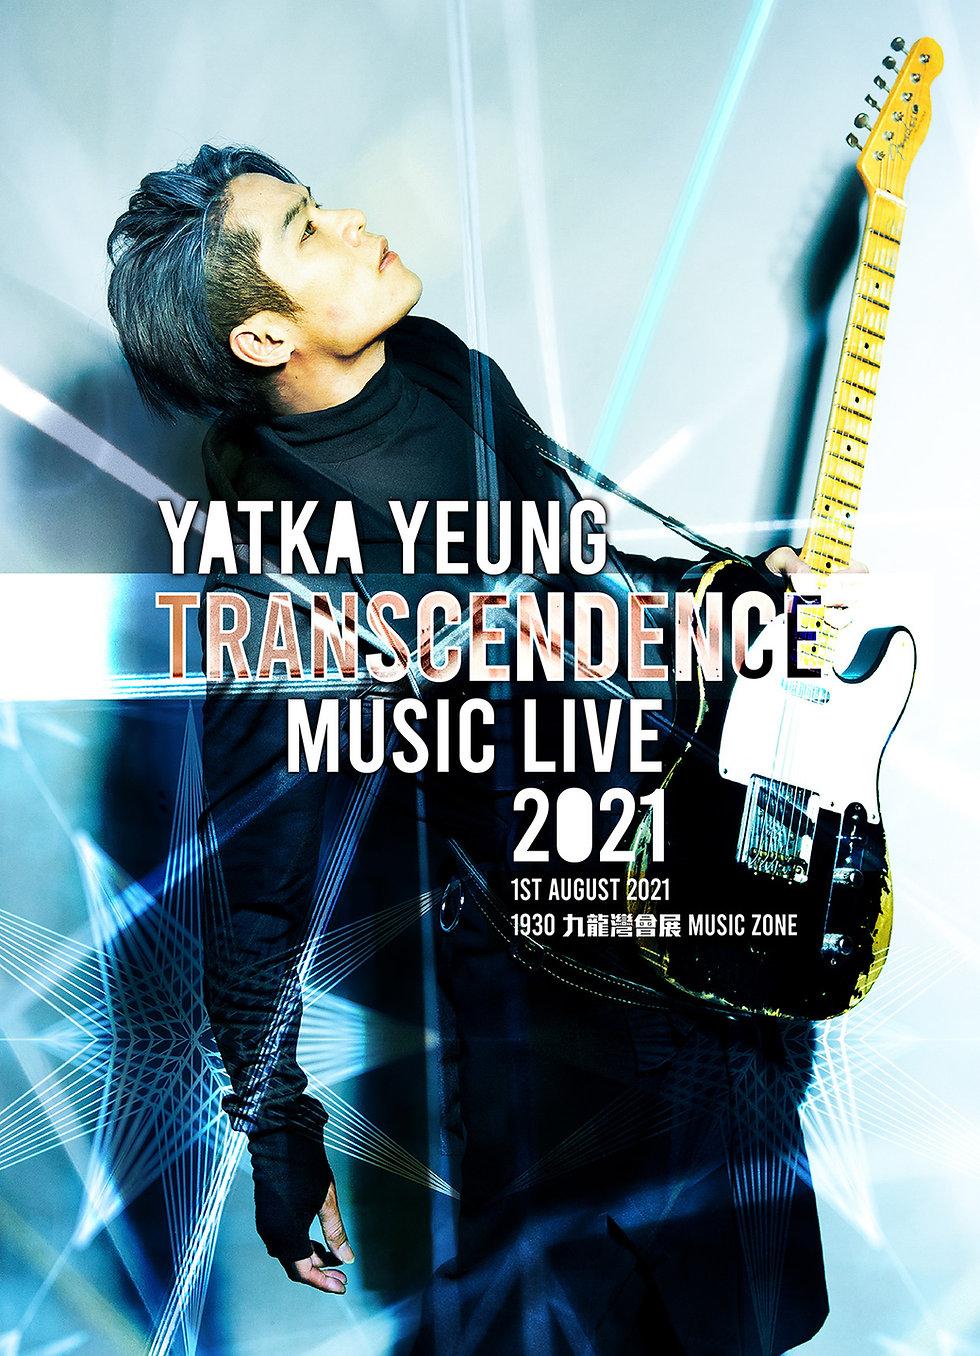 Yatka_Yeung_POSTER_FINAL-01_Web.jpg